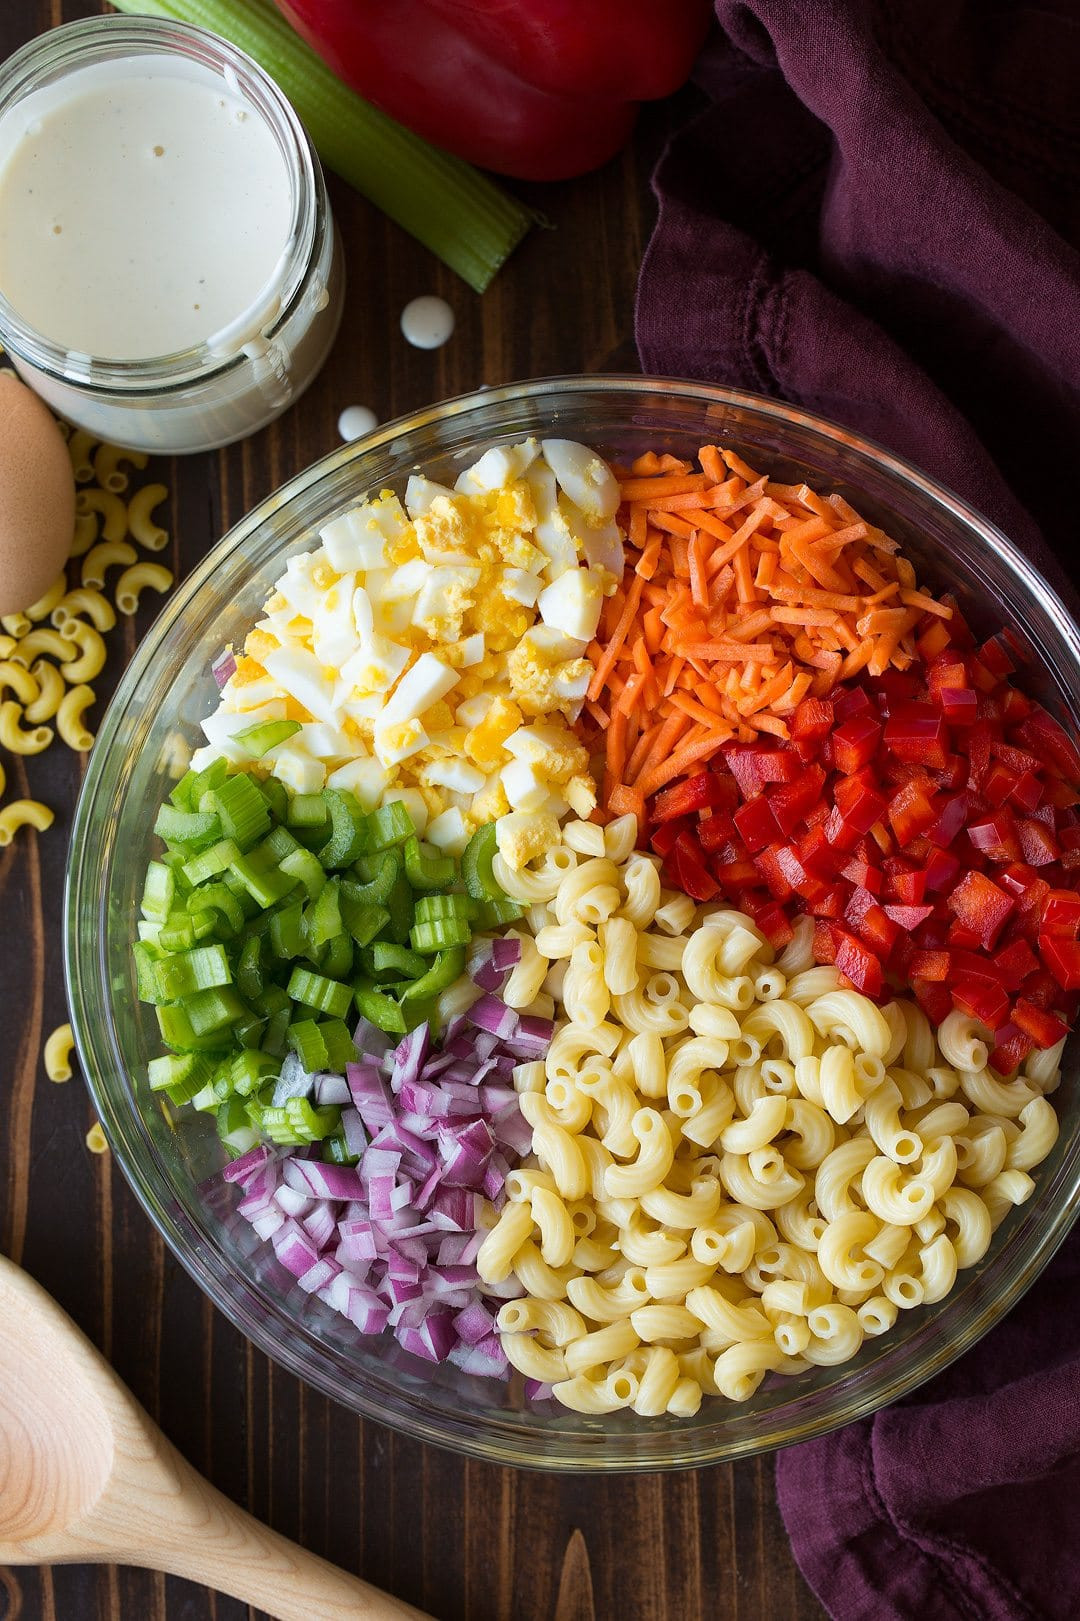 Recipe For Macaroni Salad  Classic Macaroni Salad Easy Go To Side Dish  Cooking